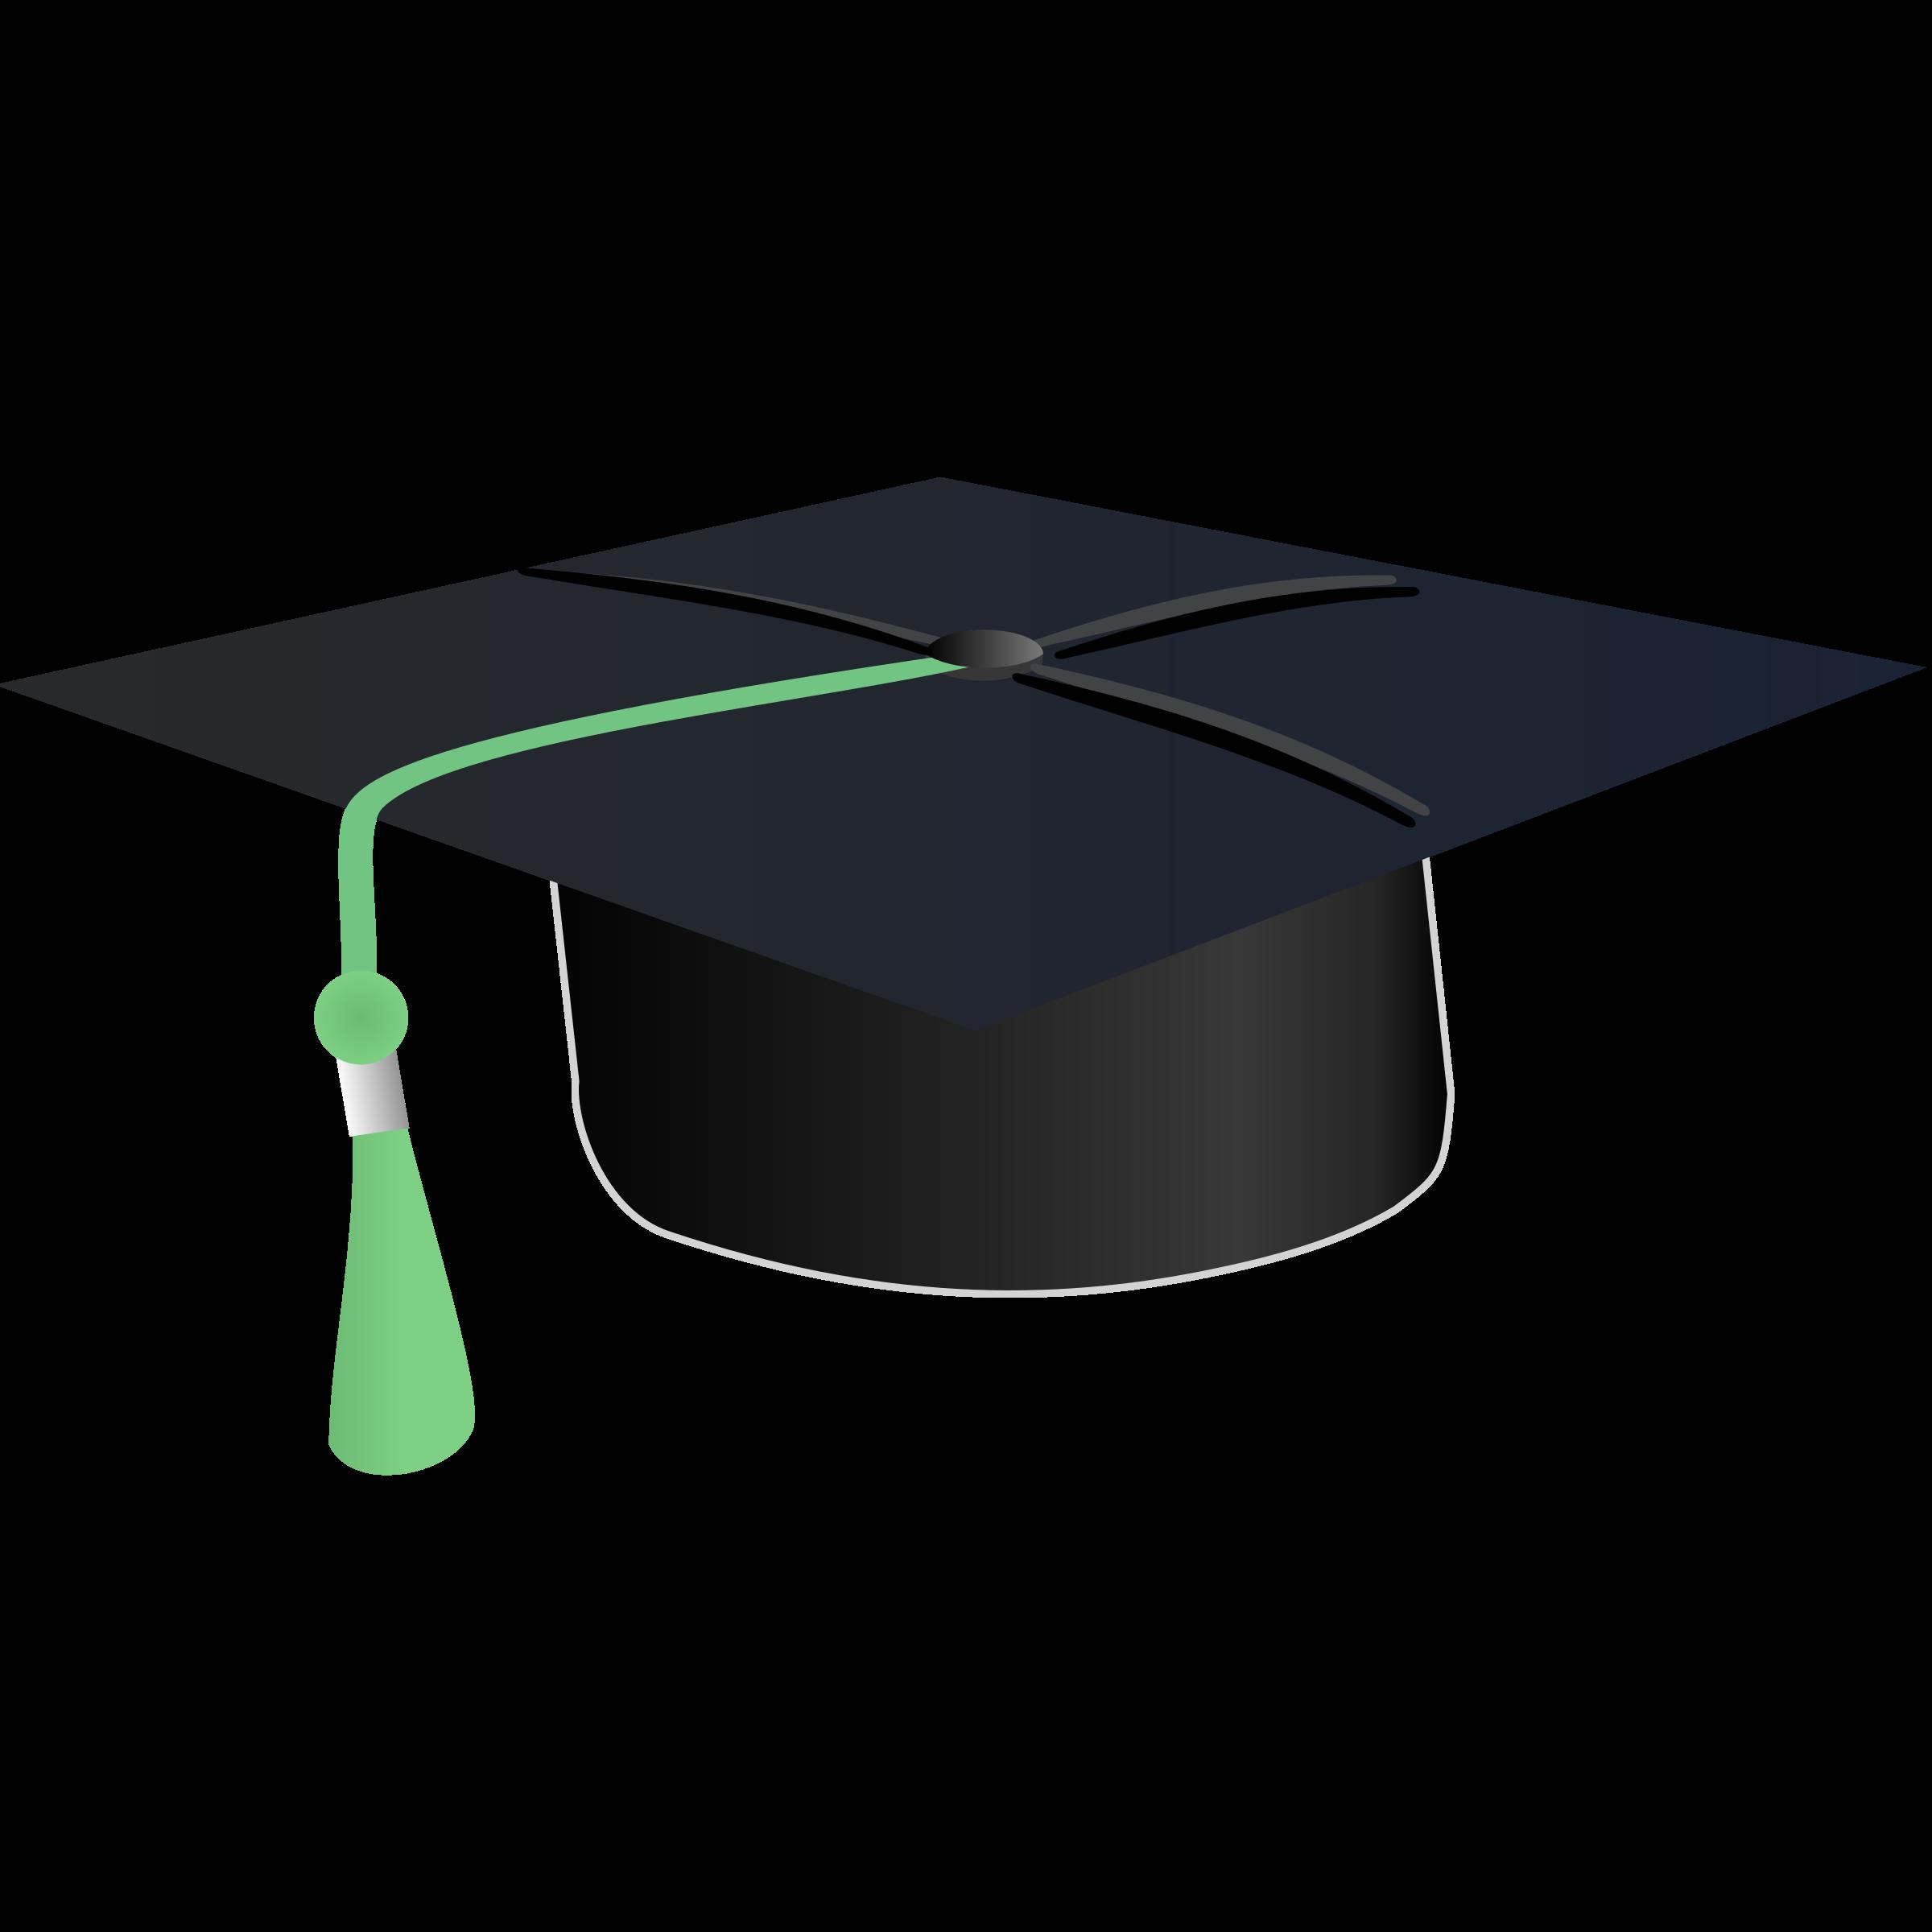 Hats student